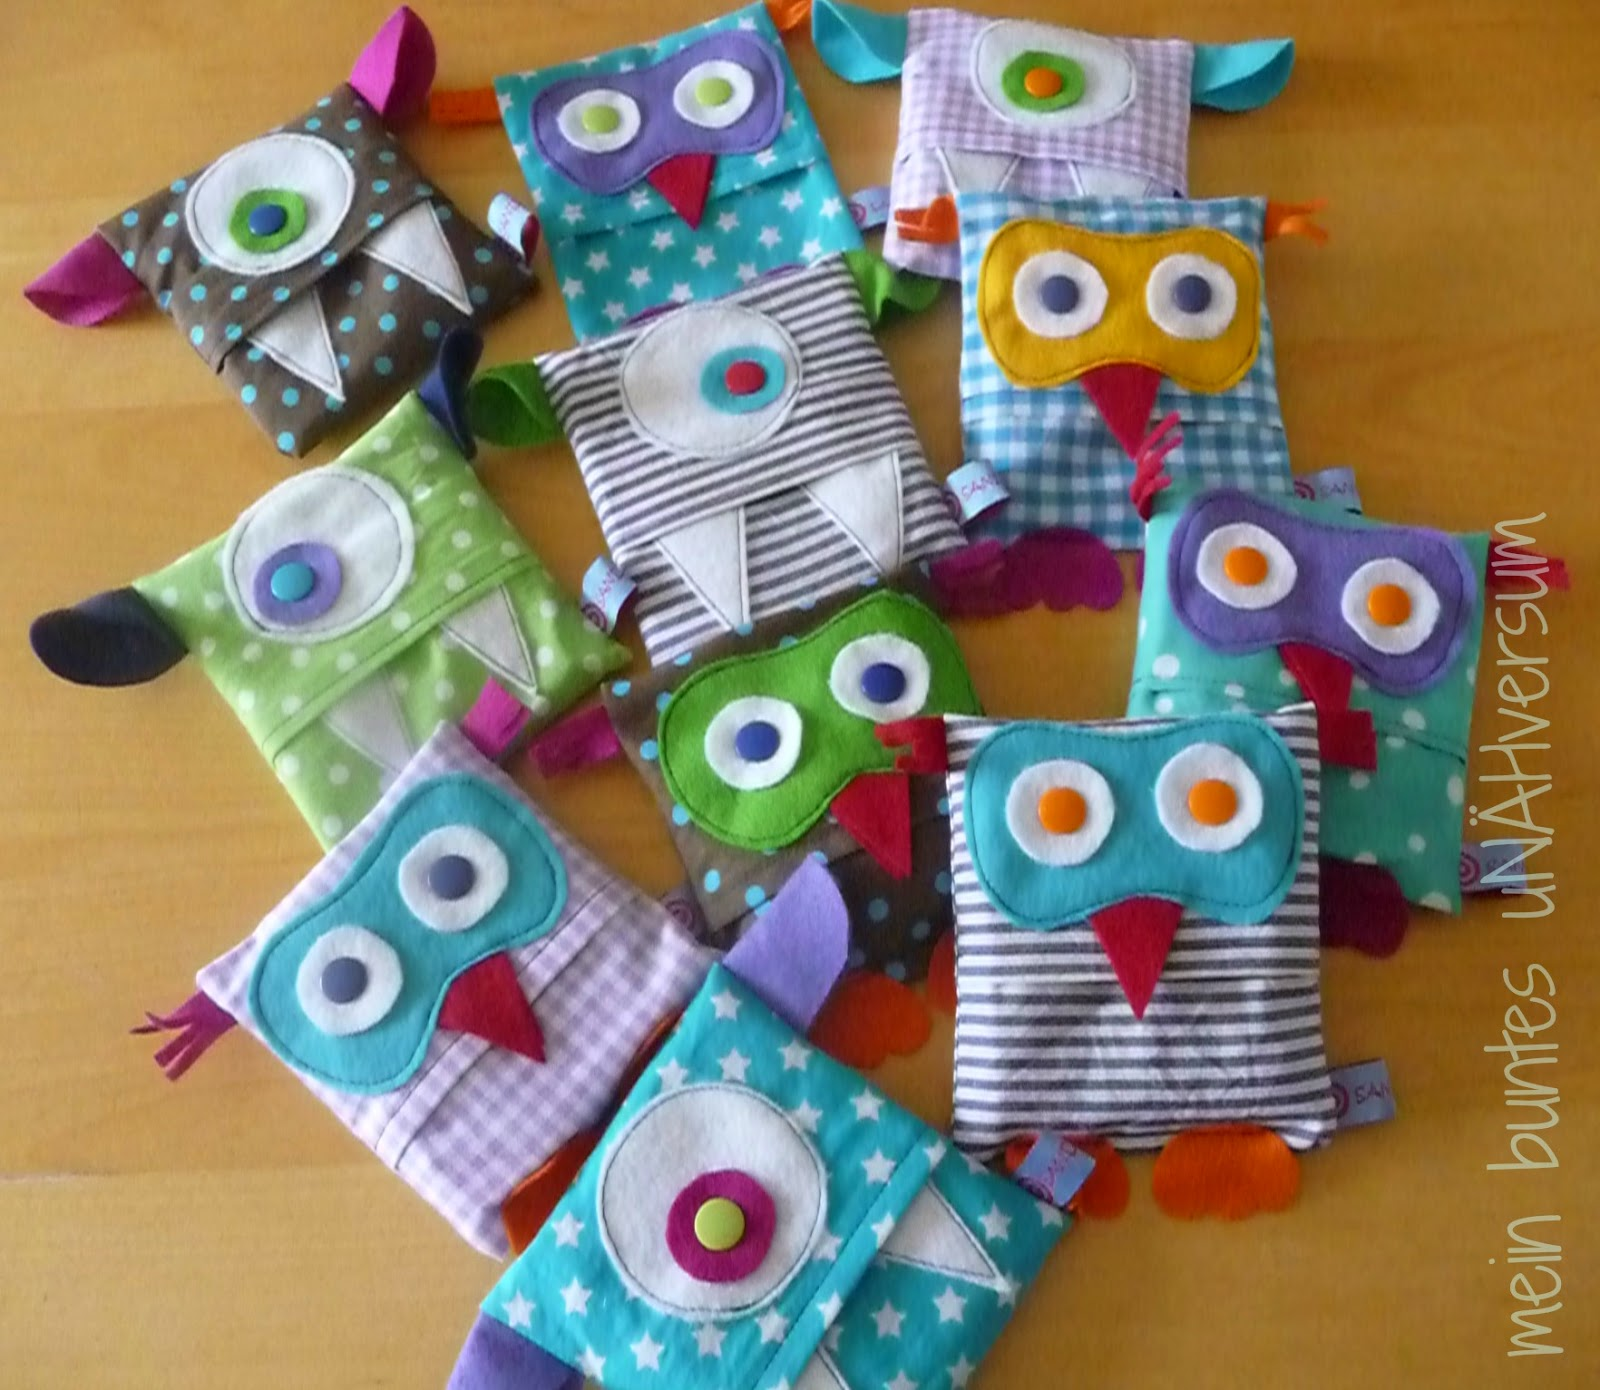 Kindergarten geburtstagsgeschenk basteln my blog - Abschiedsgeschenk ideen ...